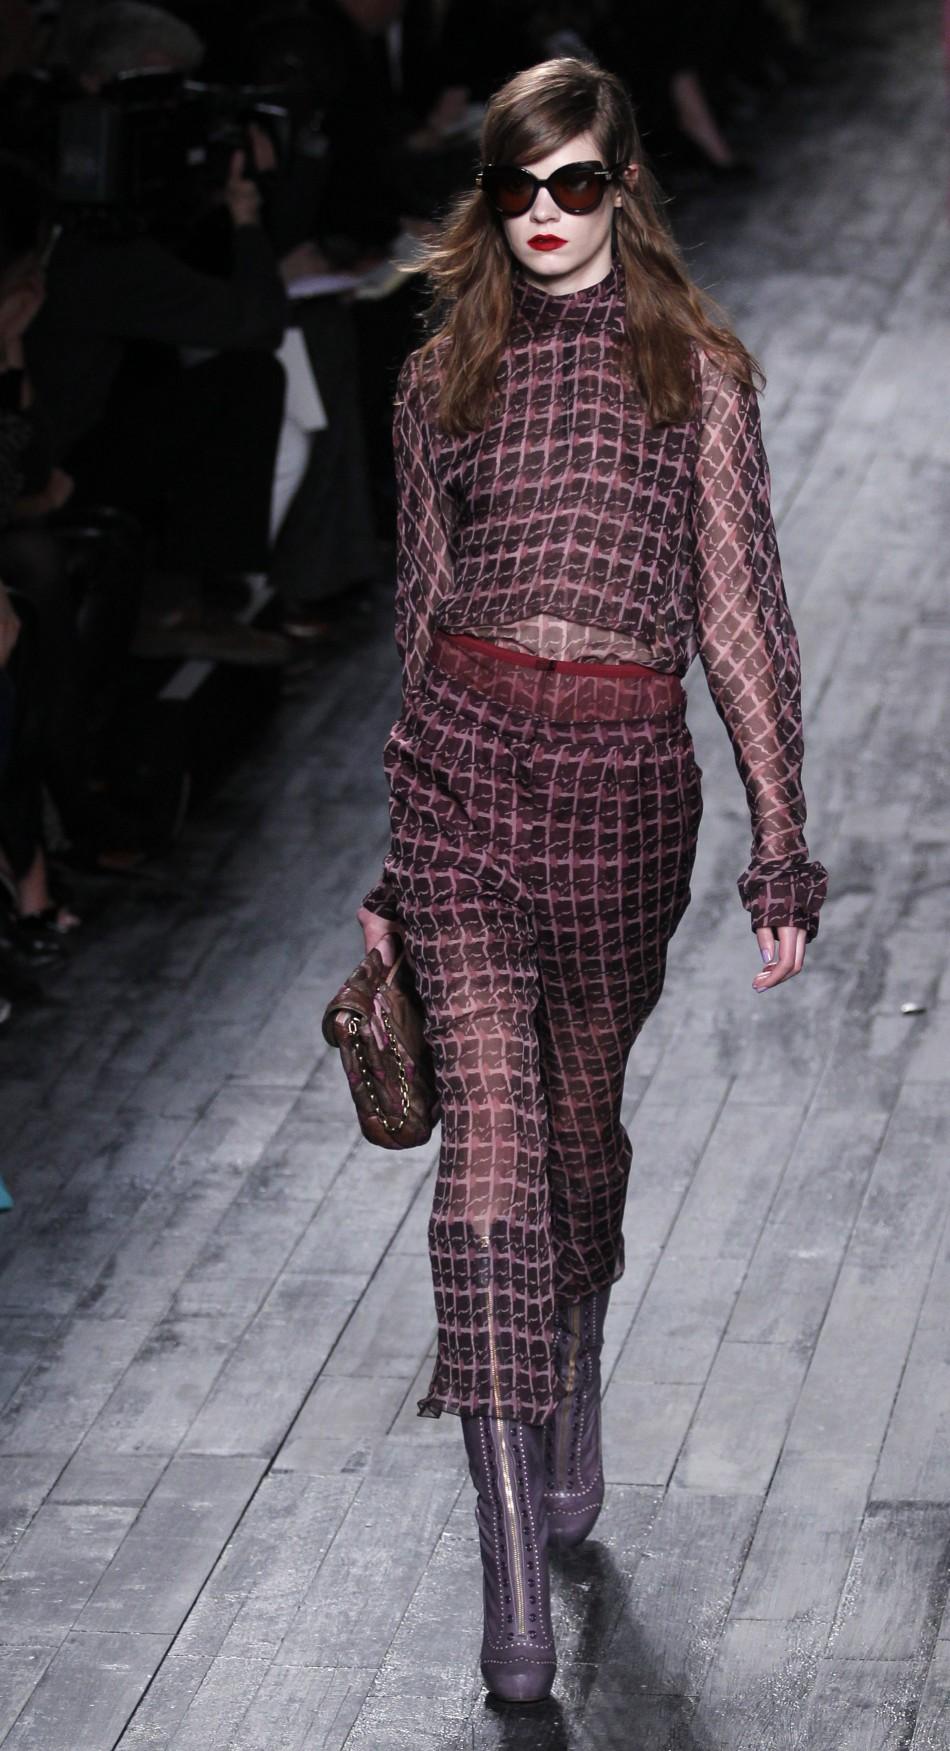 Paris Fashion Week Highlight Peter Copping For Nina Ricci